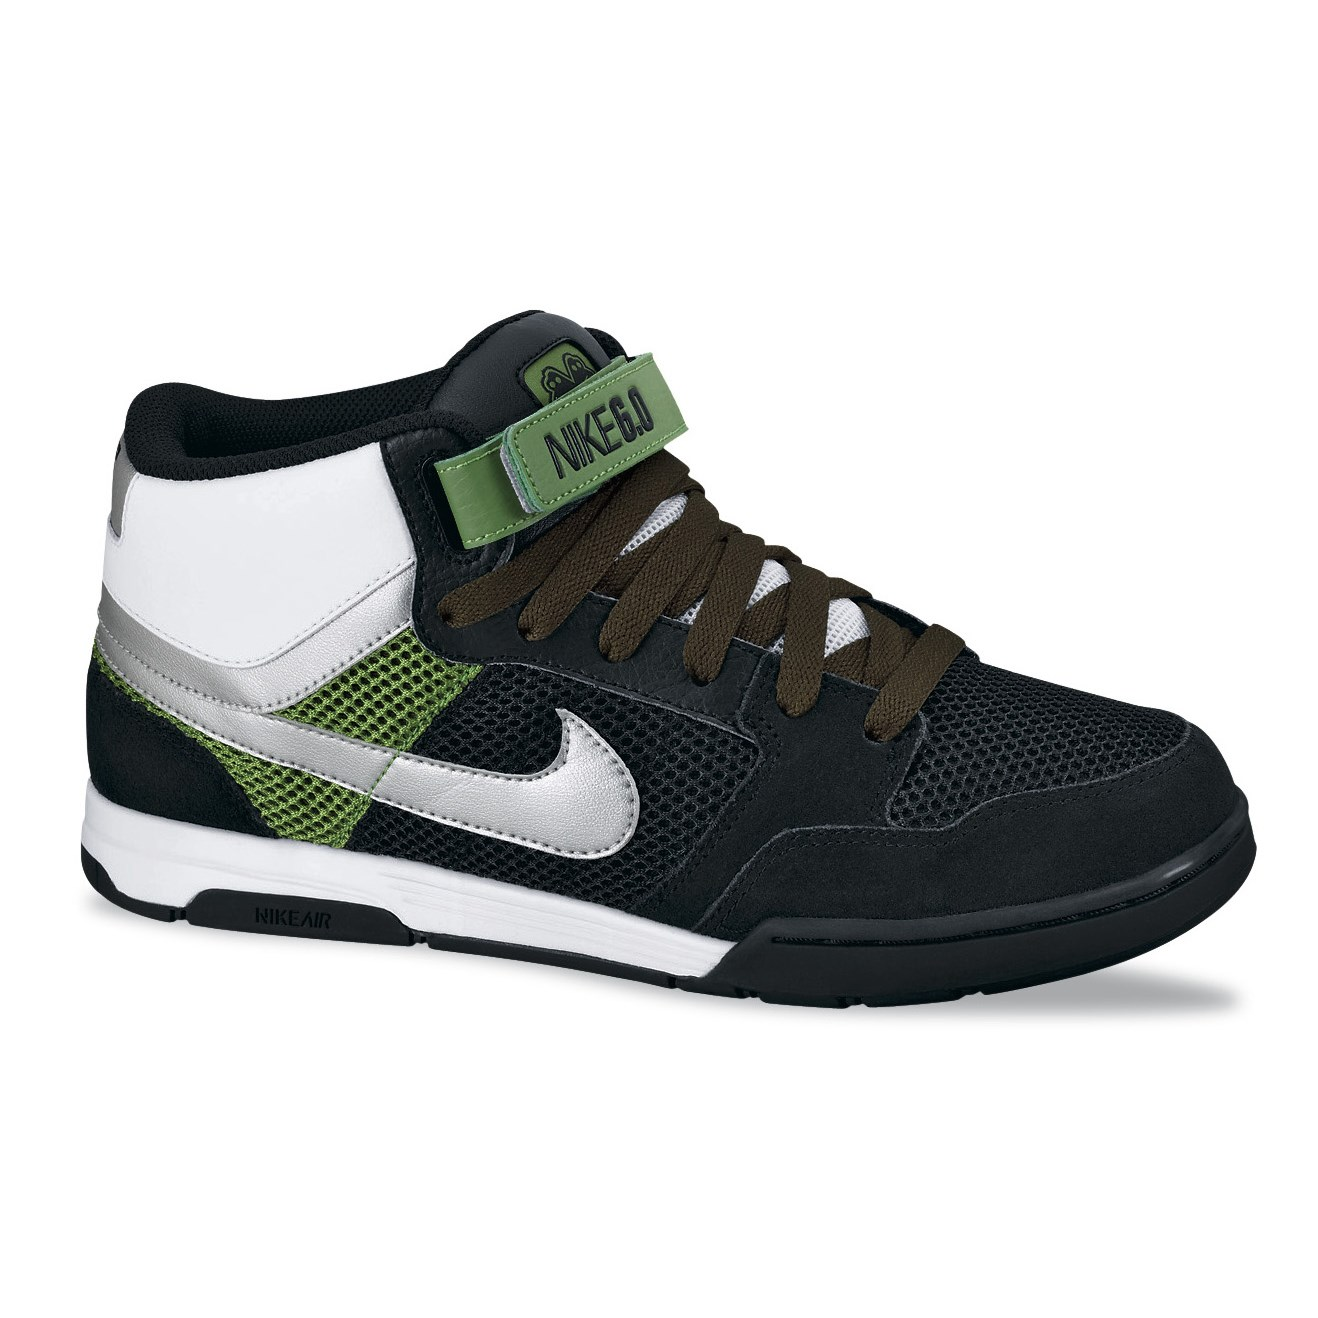 nike 6 0 skate shoes. nike 6 0 skate shoes